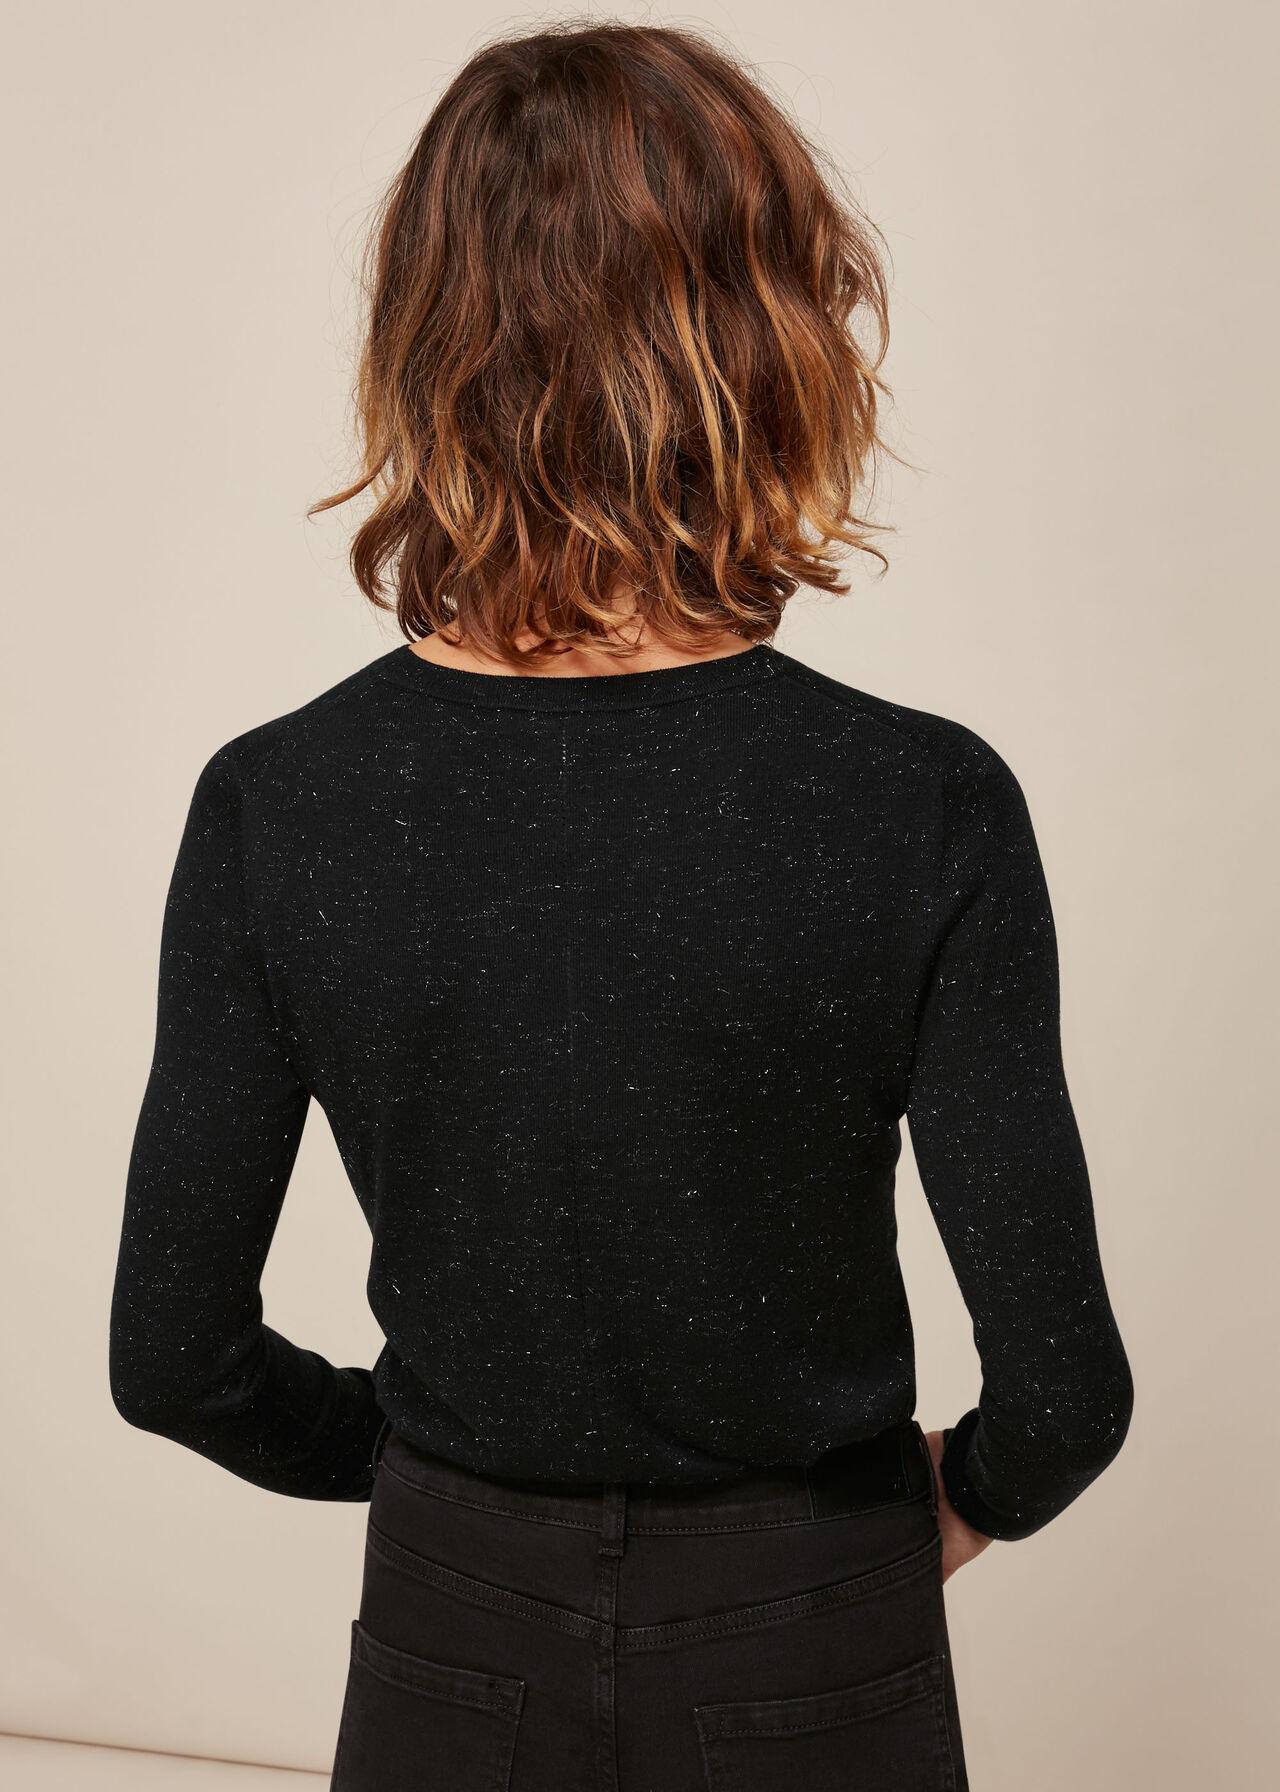 Annie Sparkle Knit Black